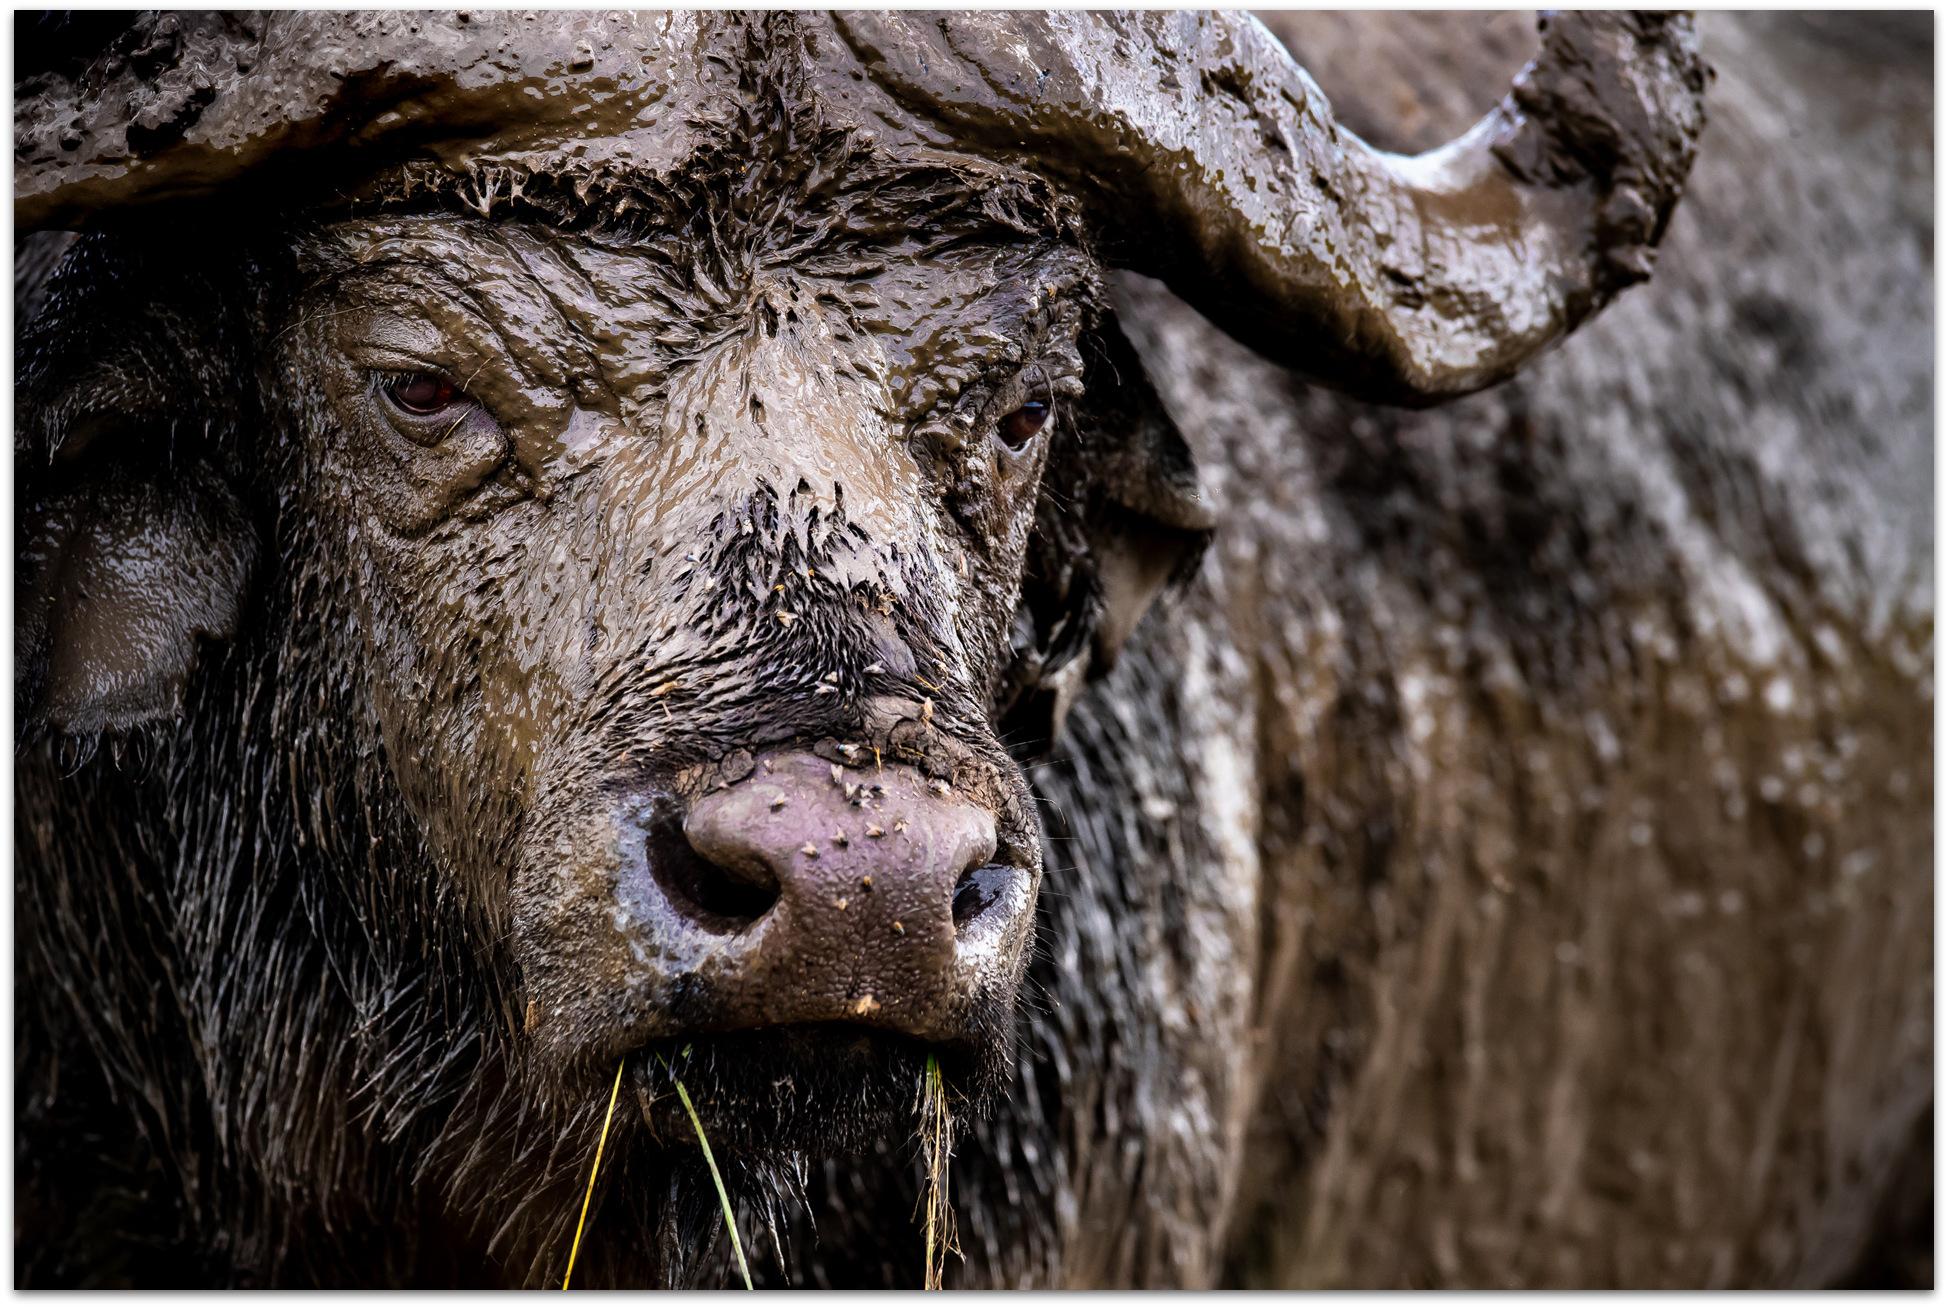 African buffalo covered in mud in the Maasai Mara